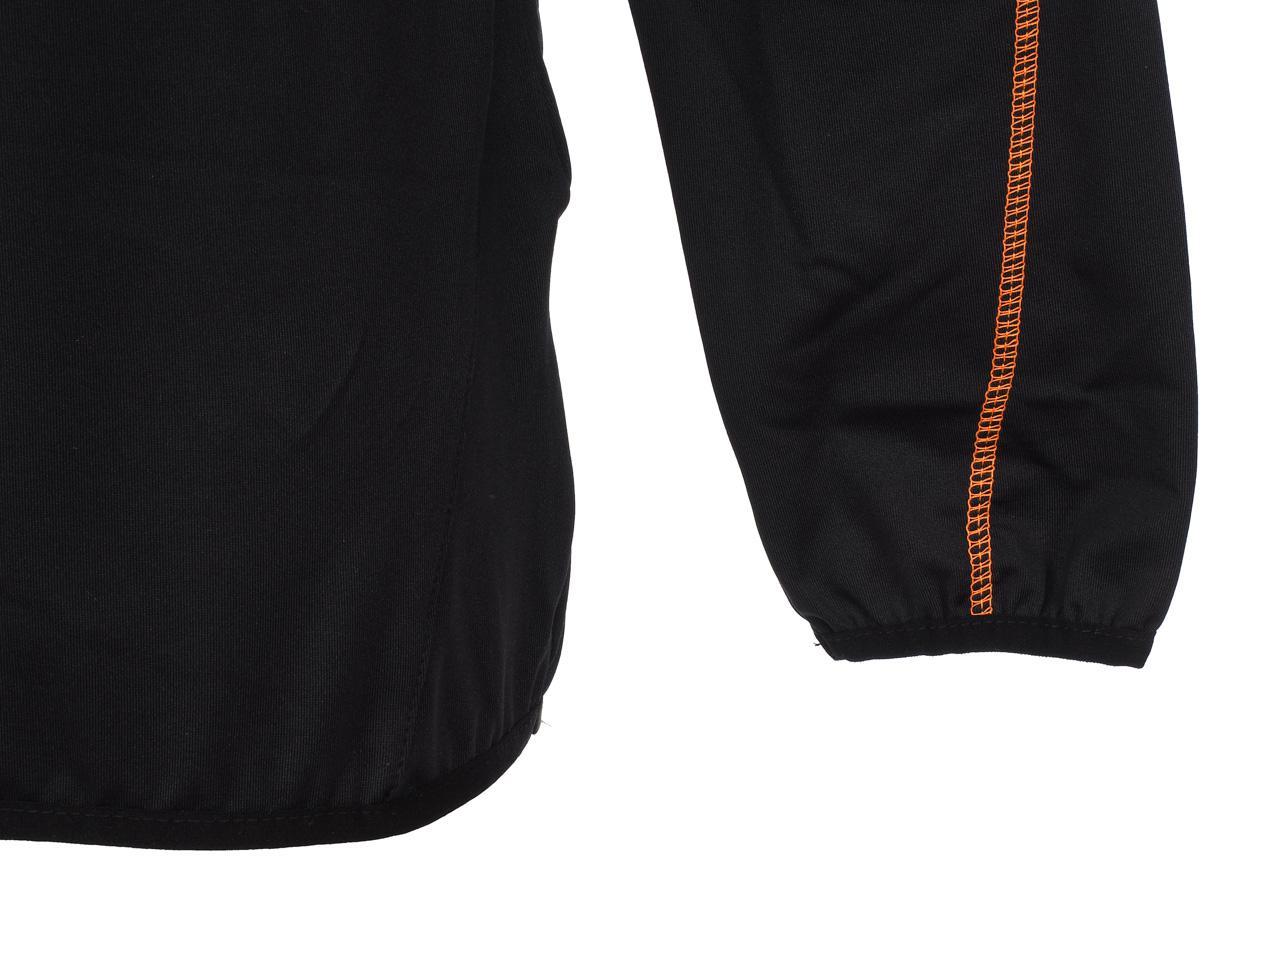 Under-Clothing-Thermal-Hot-Alpes-Vertigo-Manu-Blk-1-2z-ML-Tee-Poly-Black-251 thumbnail 4